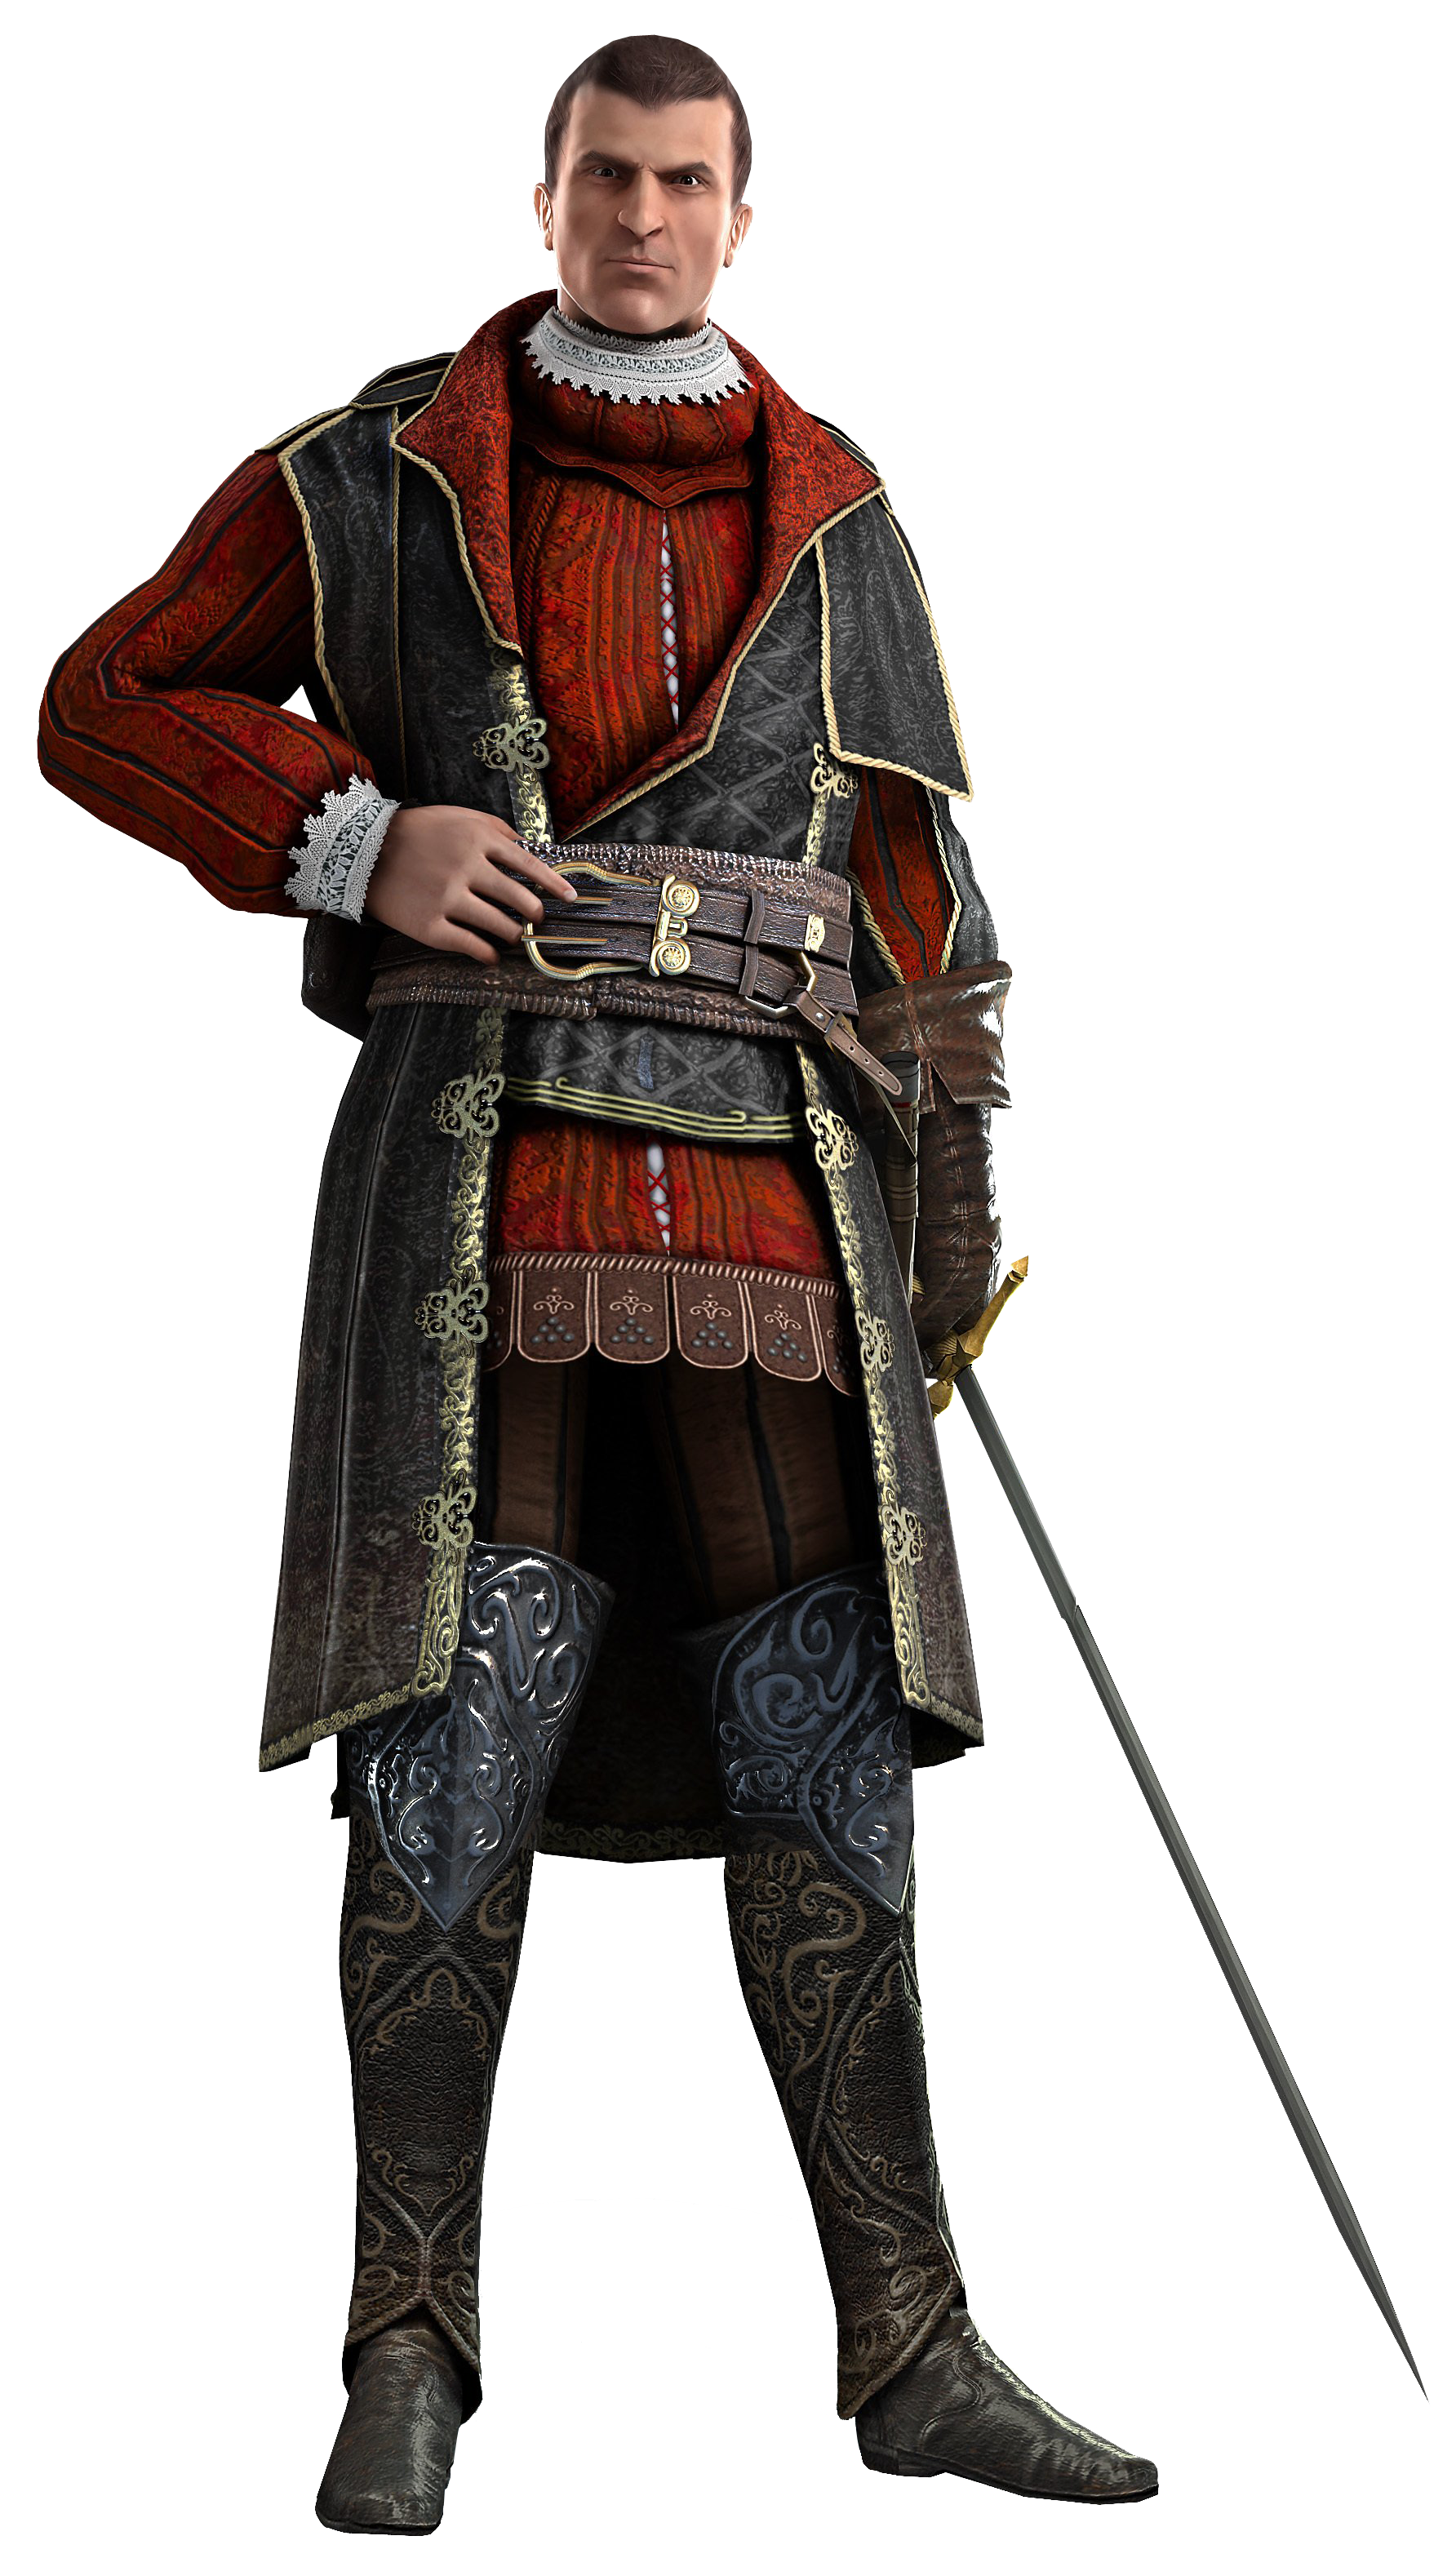 machiavelli the prince summary written machiavelli